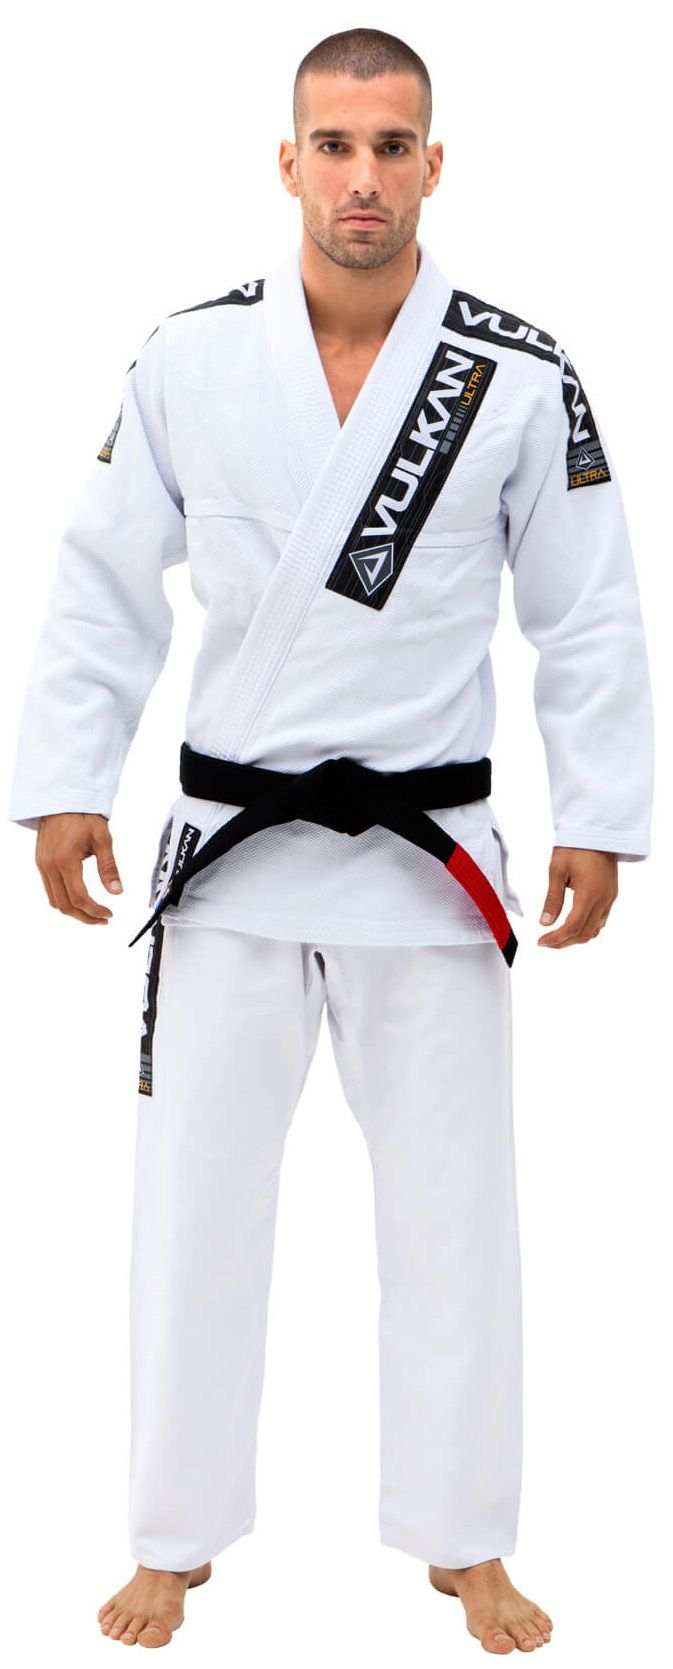 4e55b4a31a342 Kimono Vulkan Para Jiu-jitsu Profissional Adulto Masculino - ULTRA LIGHT  BRANCO